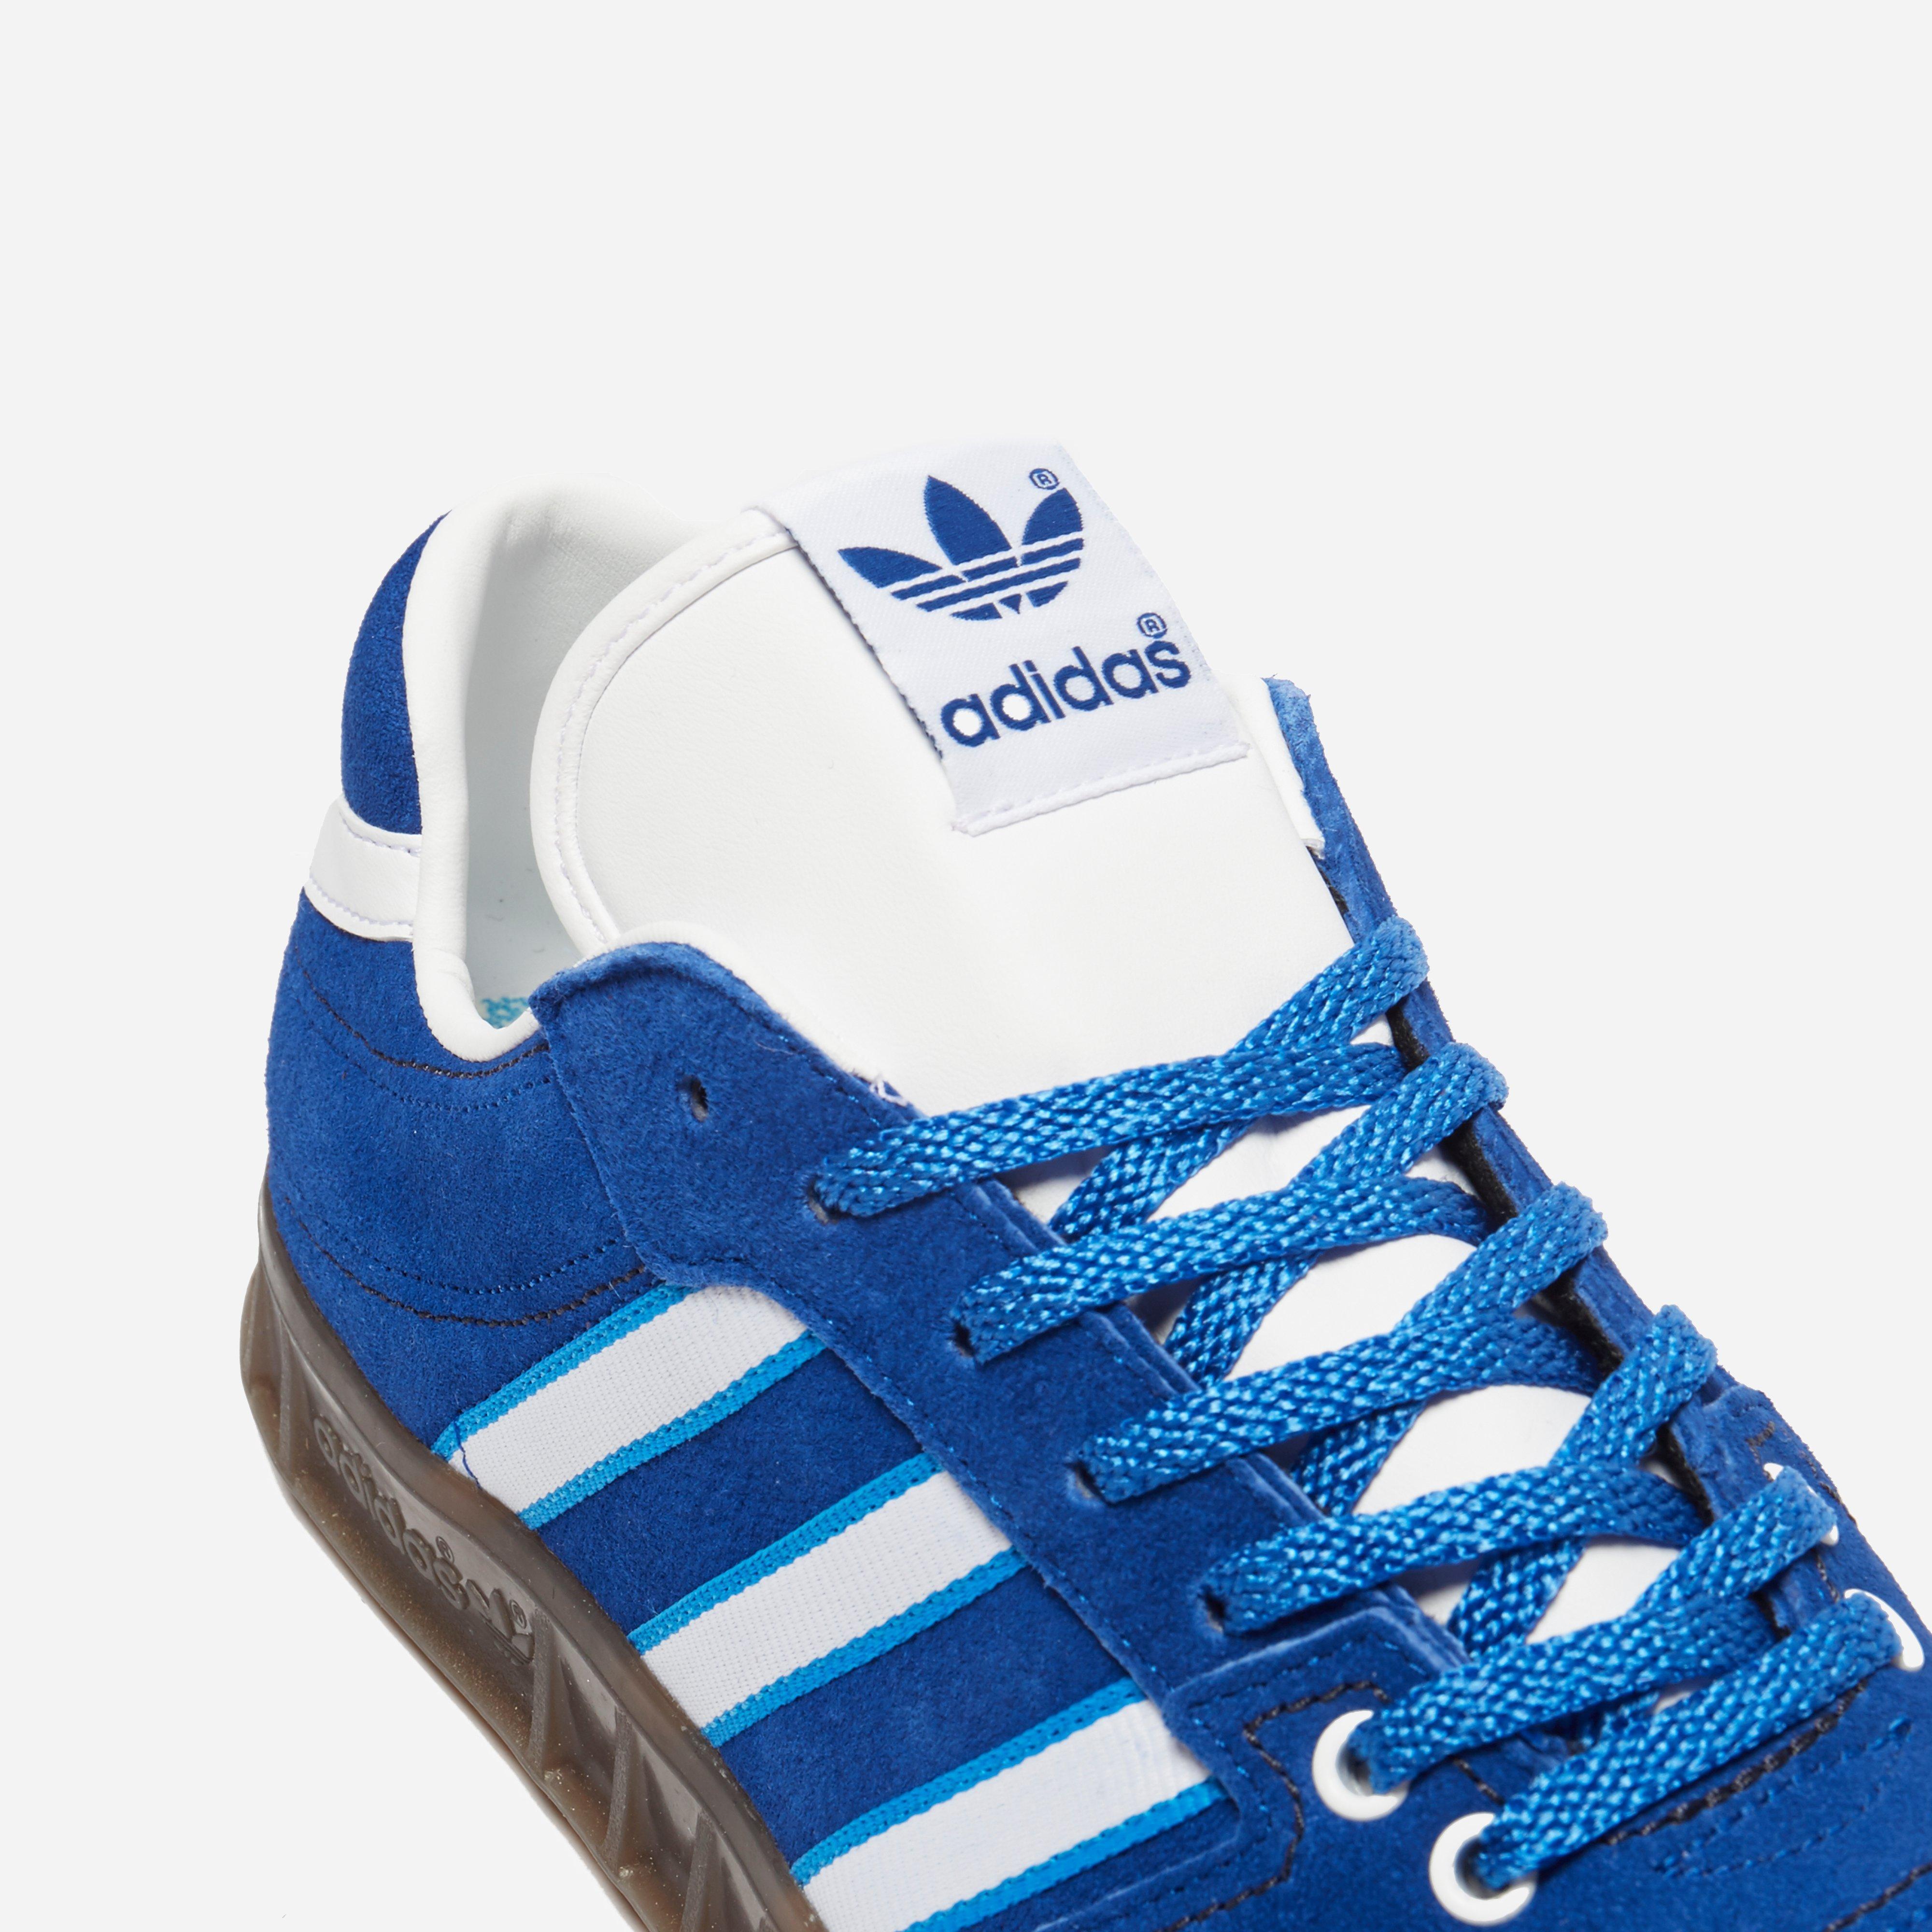 new style f15cf 31043 adidas Originals Adidas Originals Handball Kreft Spzl in Blu